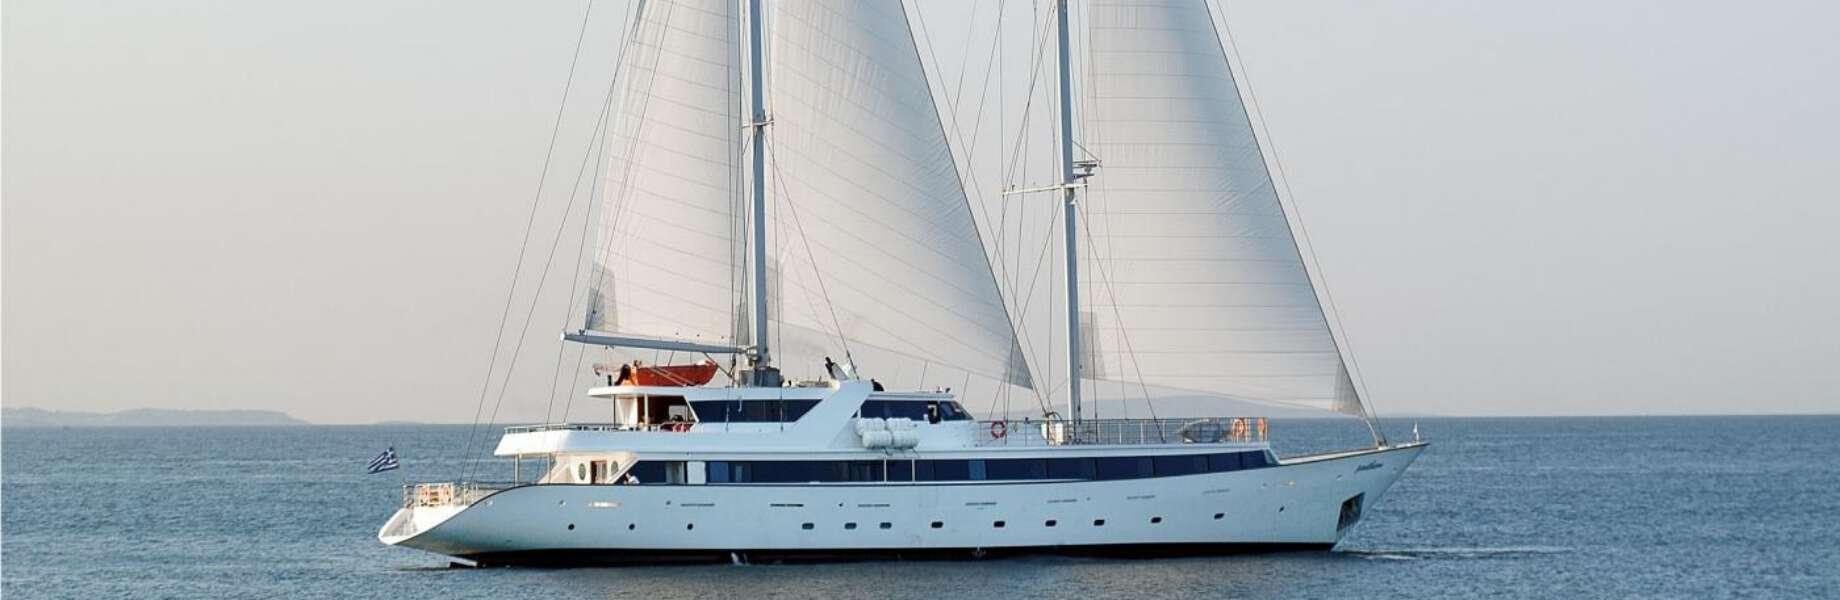 Indonesia Island Cruise